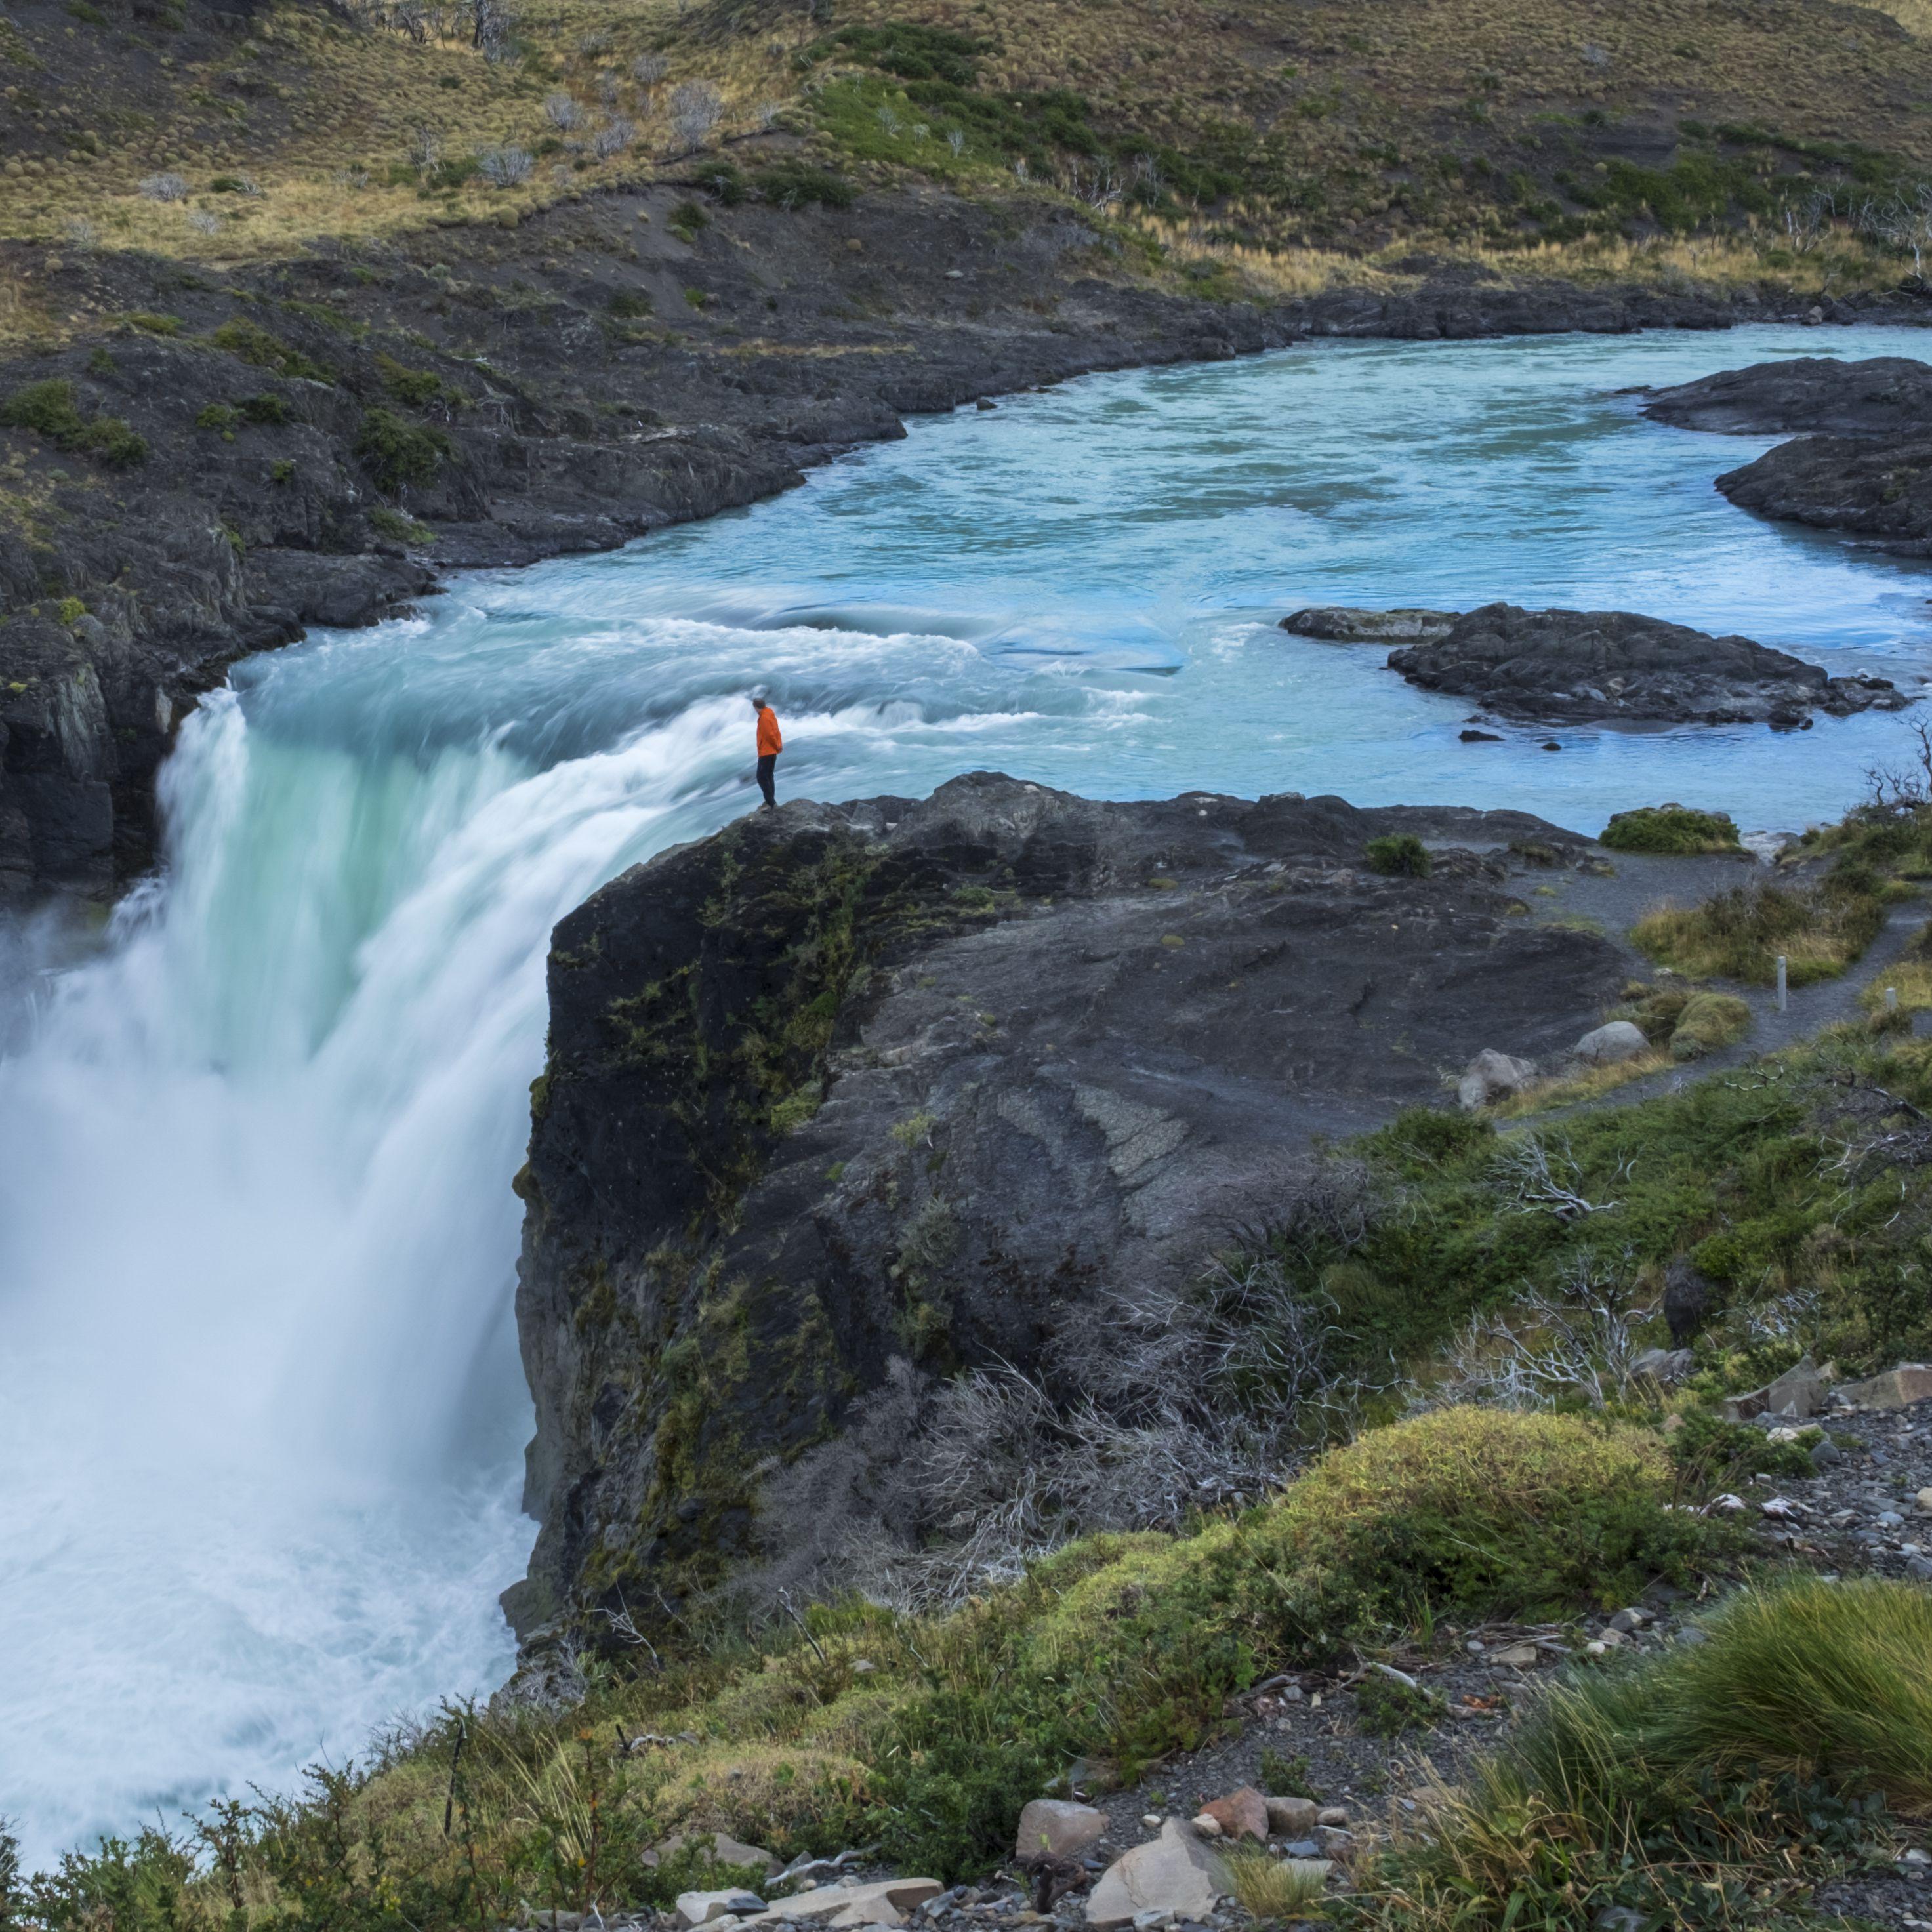 Salto Grande Waterfall in Chile